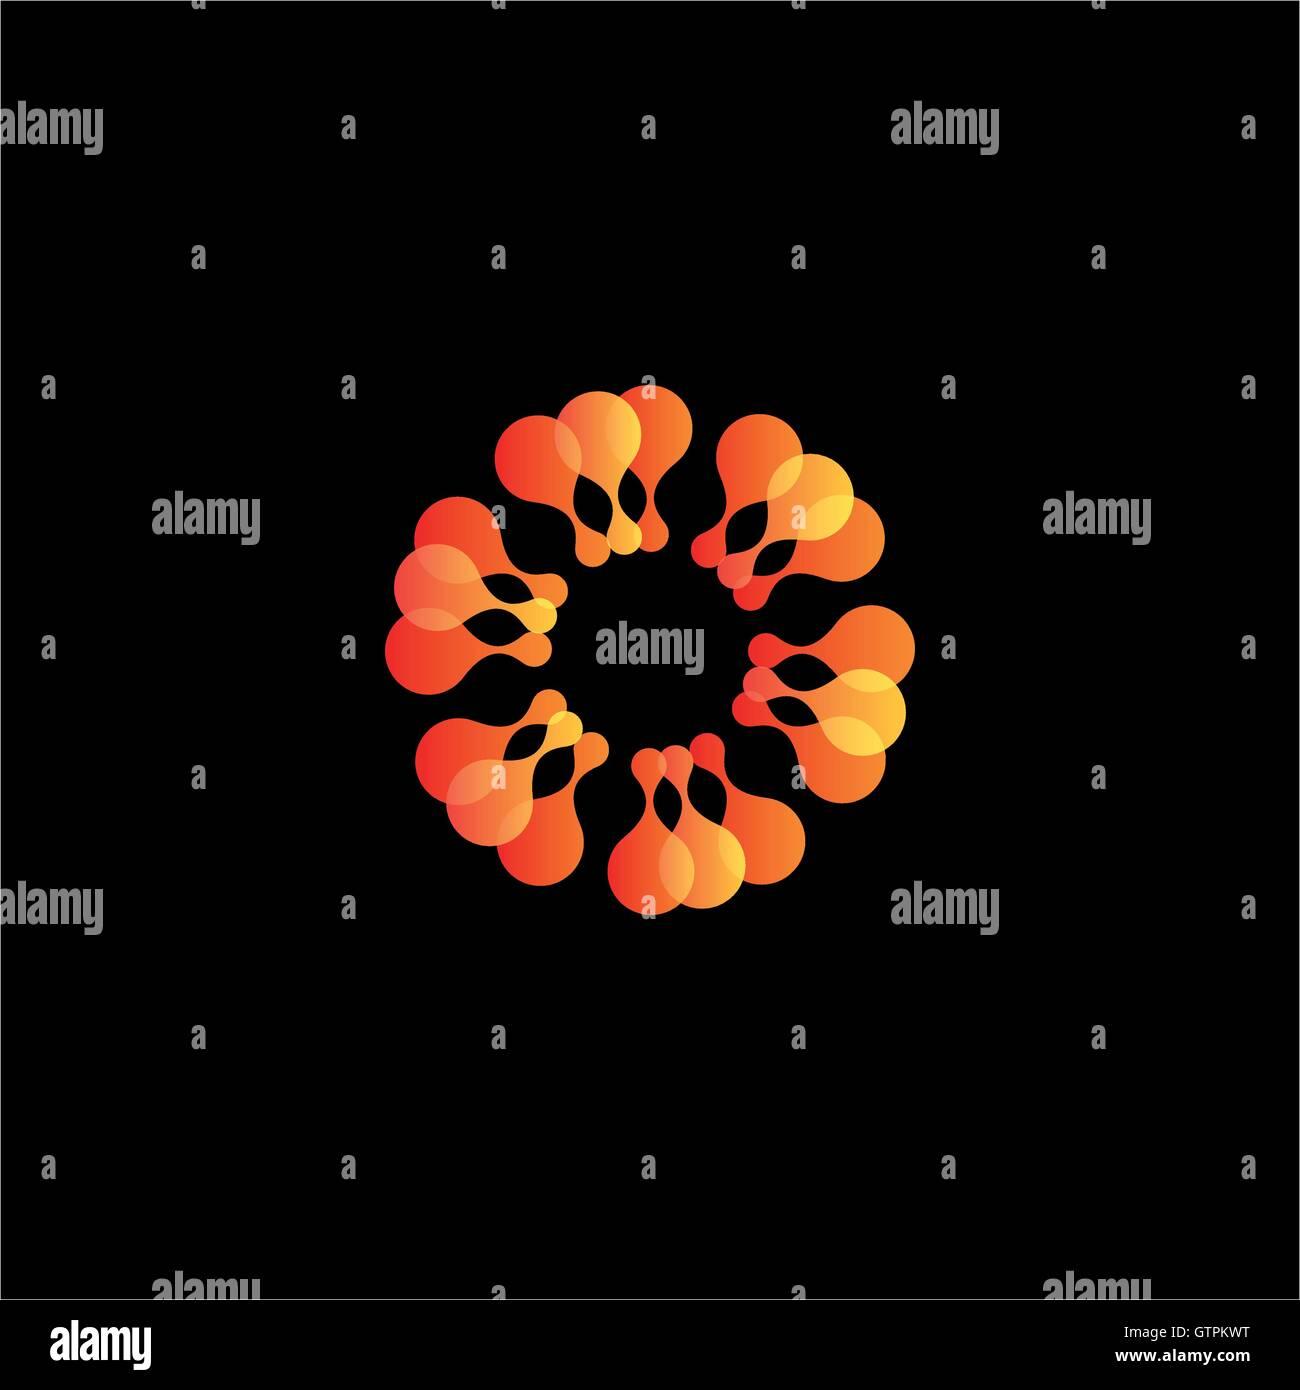 Isolated abstract orange flower vector logo. Sun illustration. Stock Vector